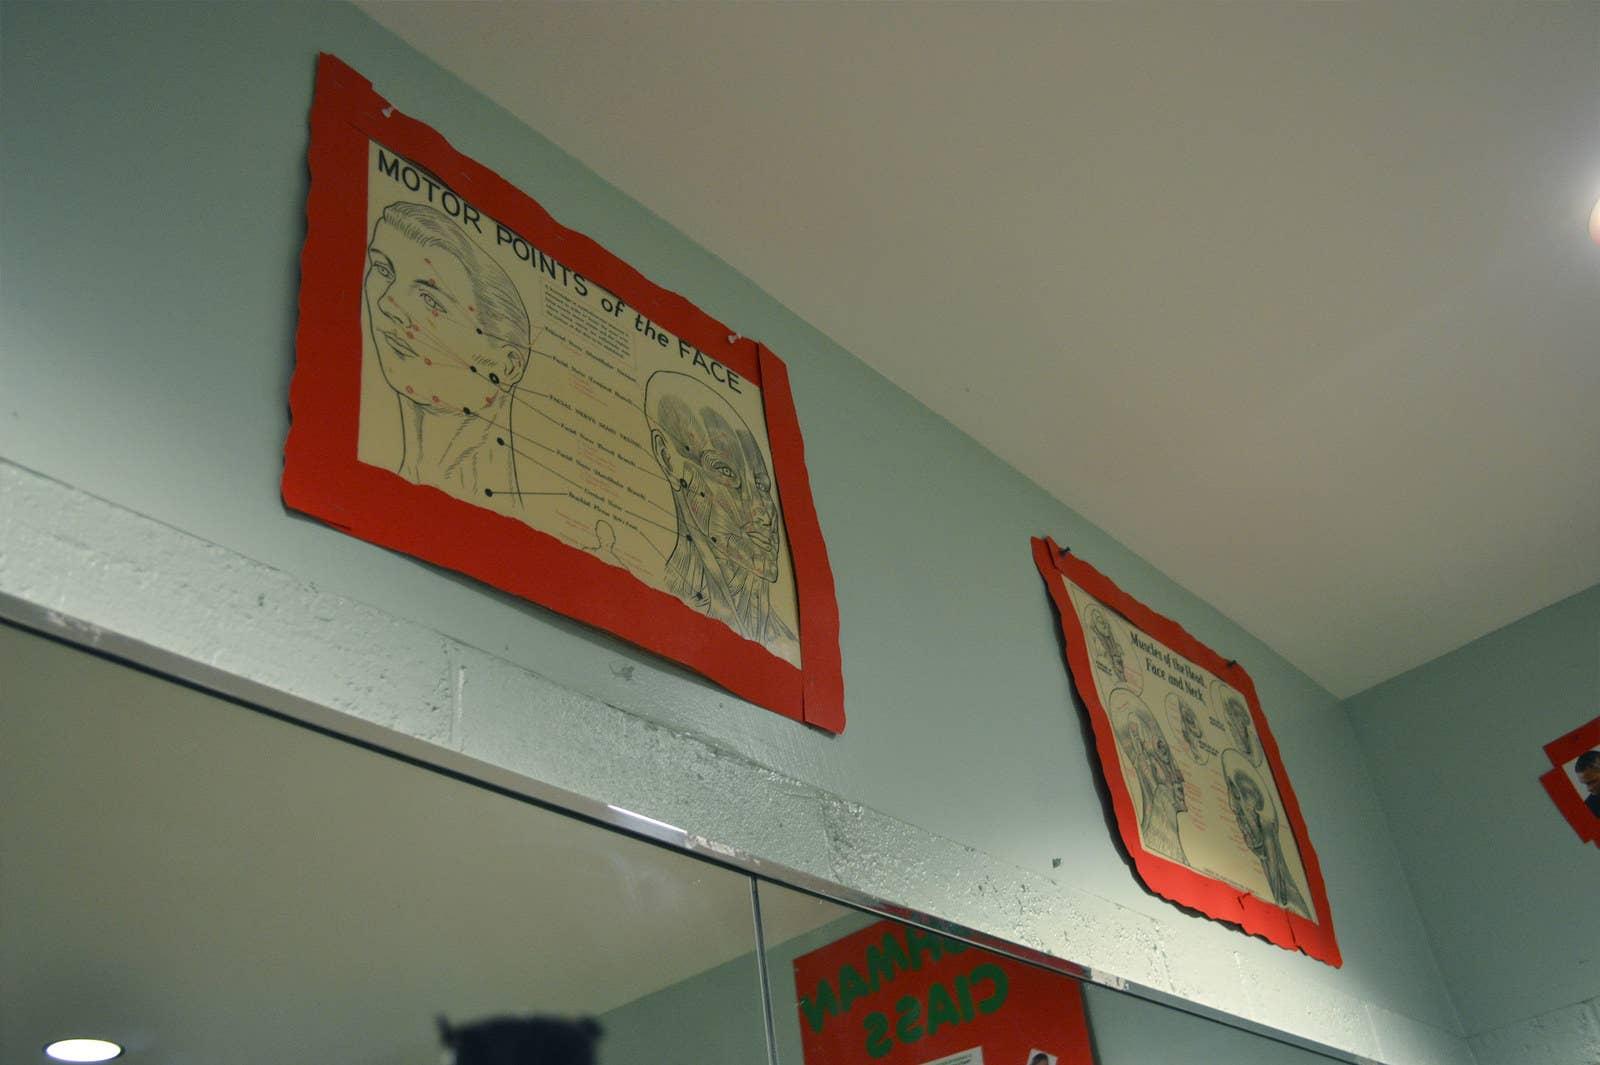 Diagrams hang in the Pro Way classroom.